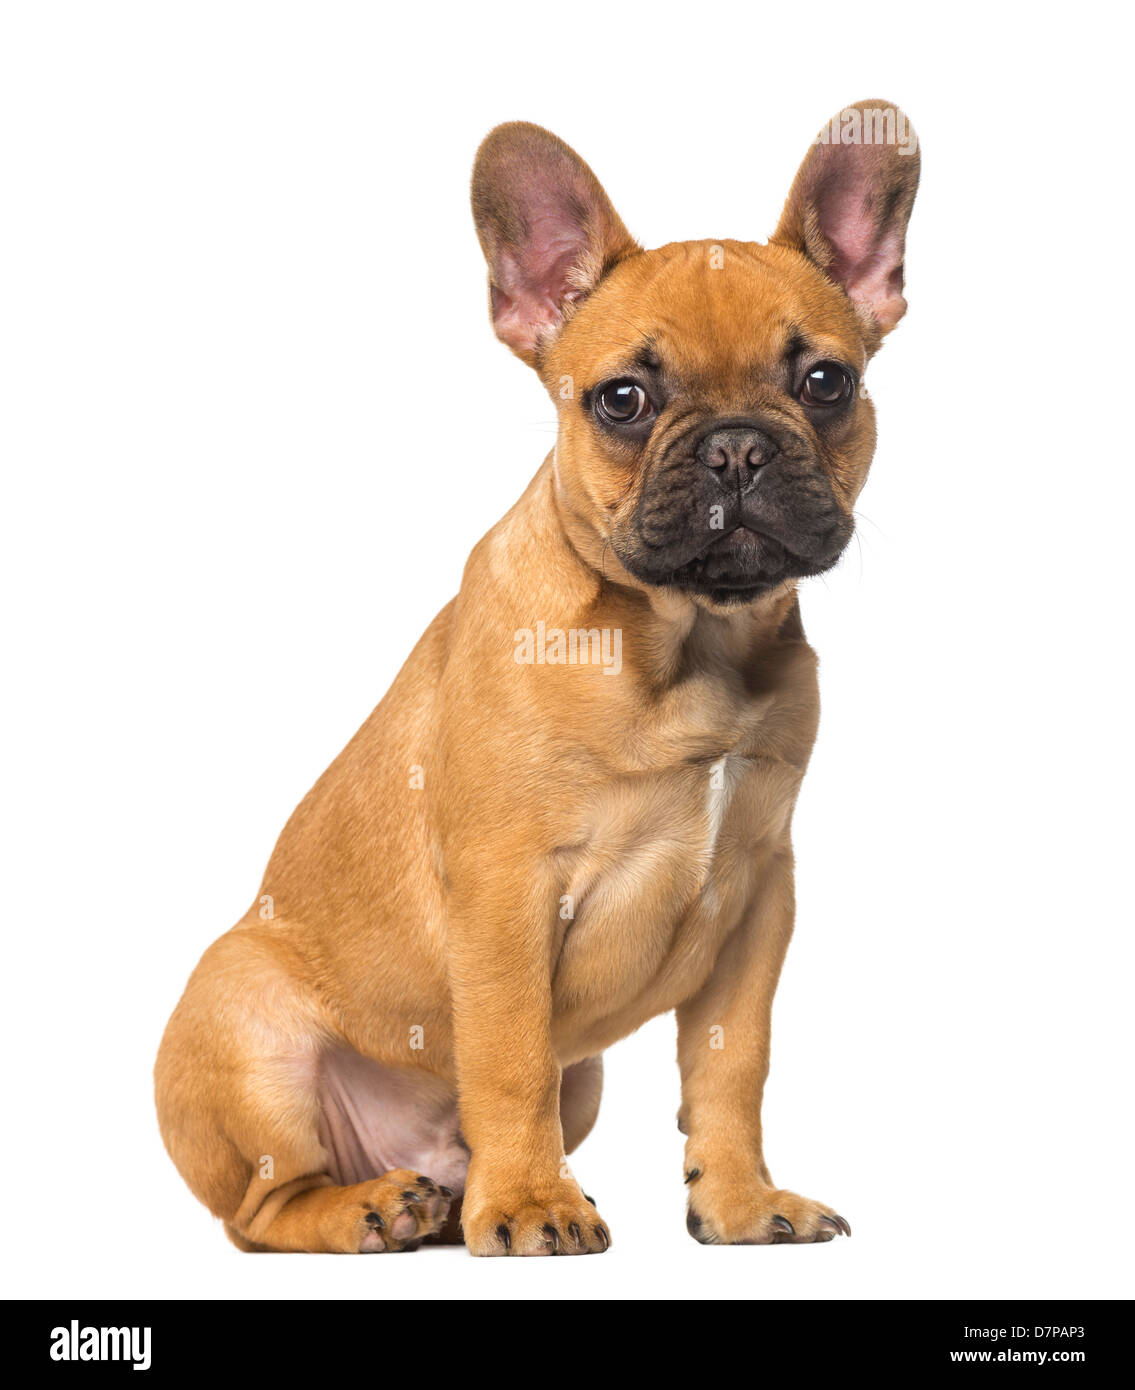 French Bulldog Puppy Old Sitting Fotos E Imagenes De Stock Alamy